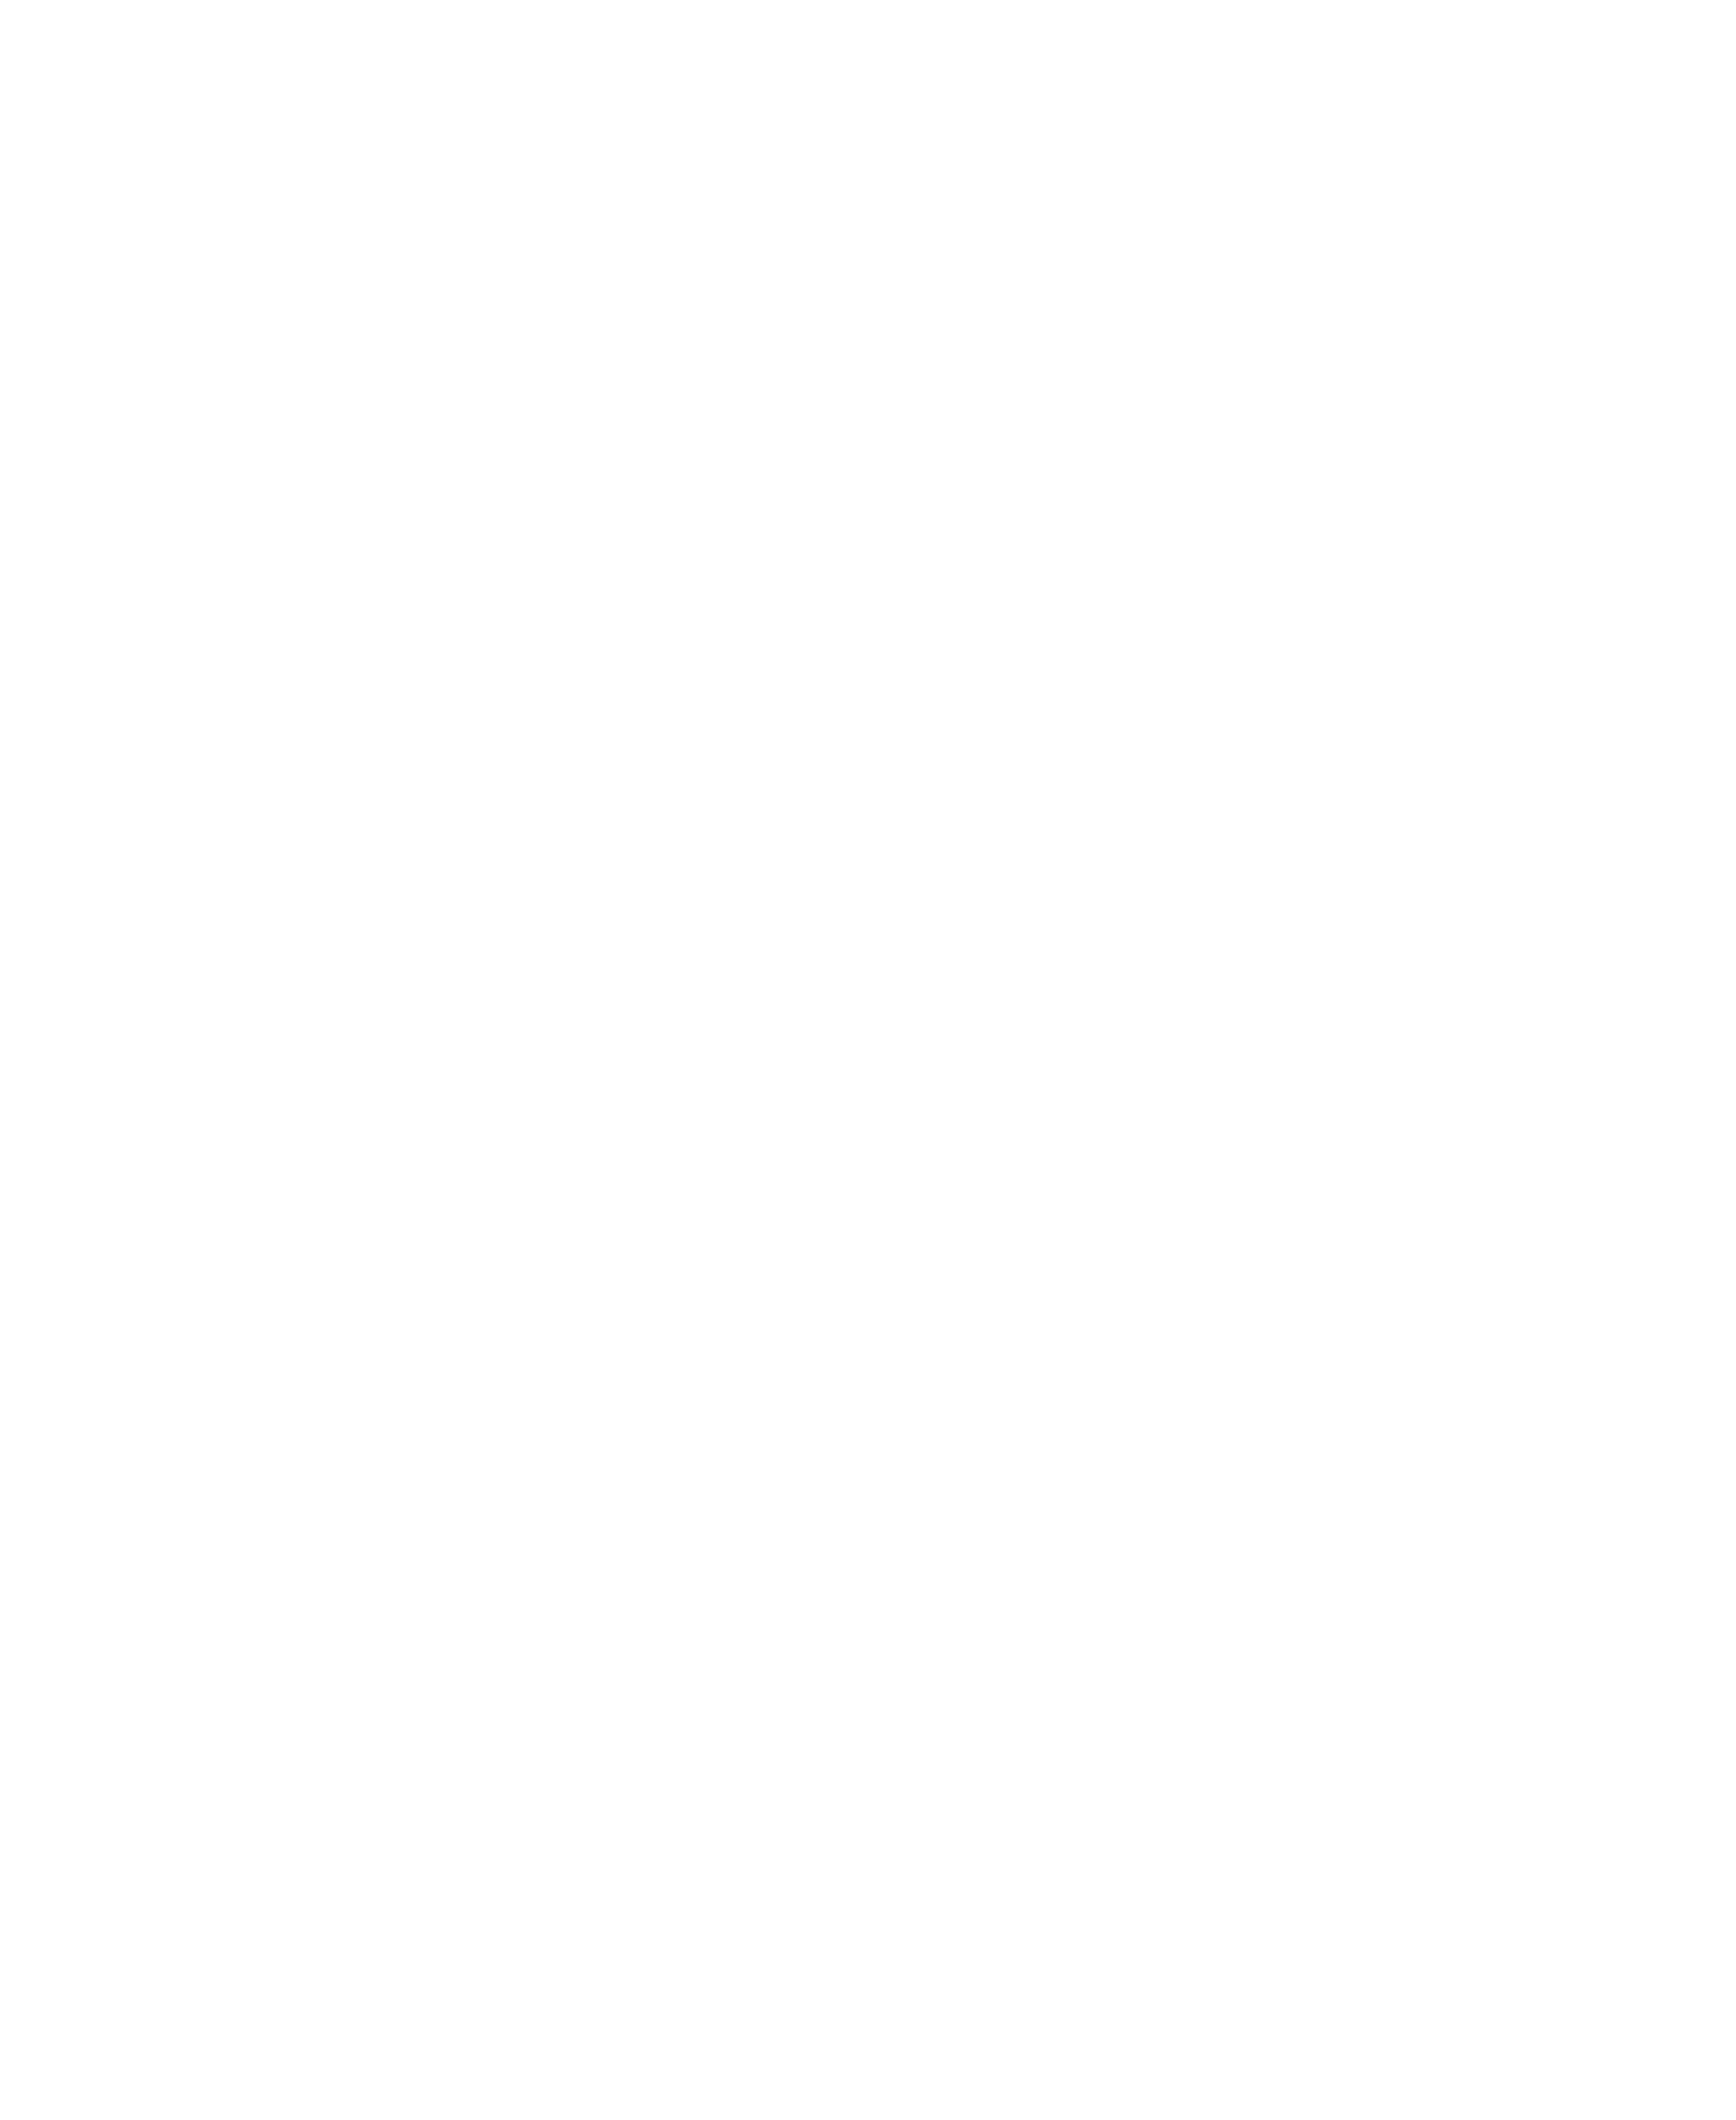 oliviagasser